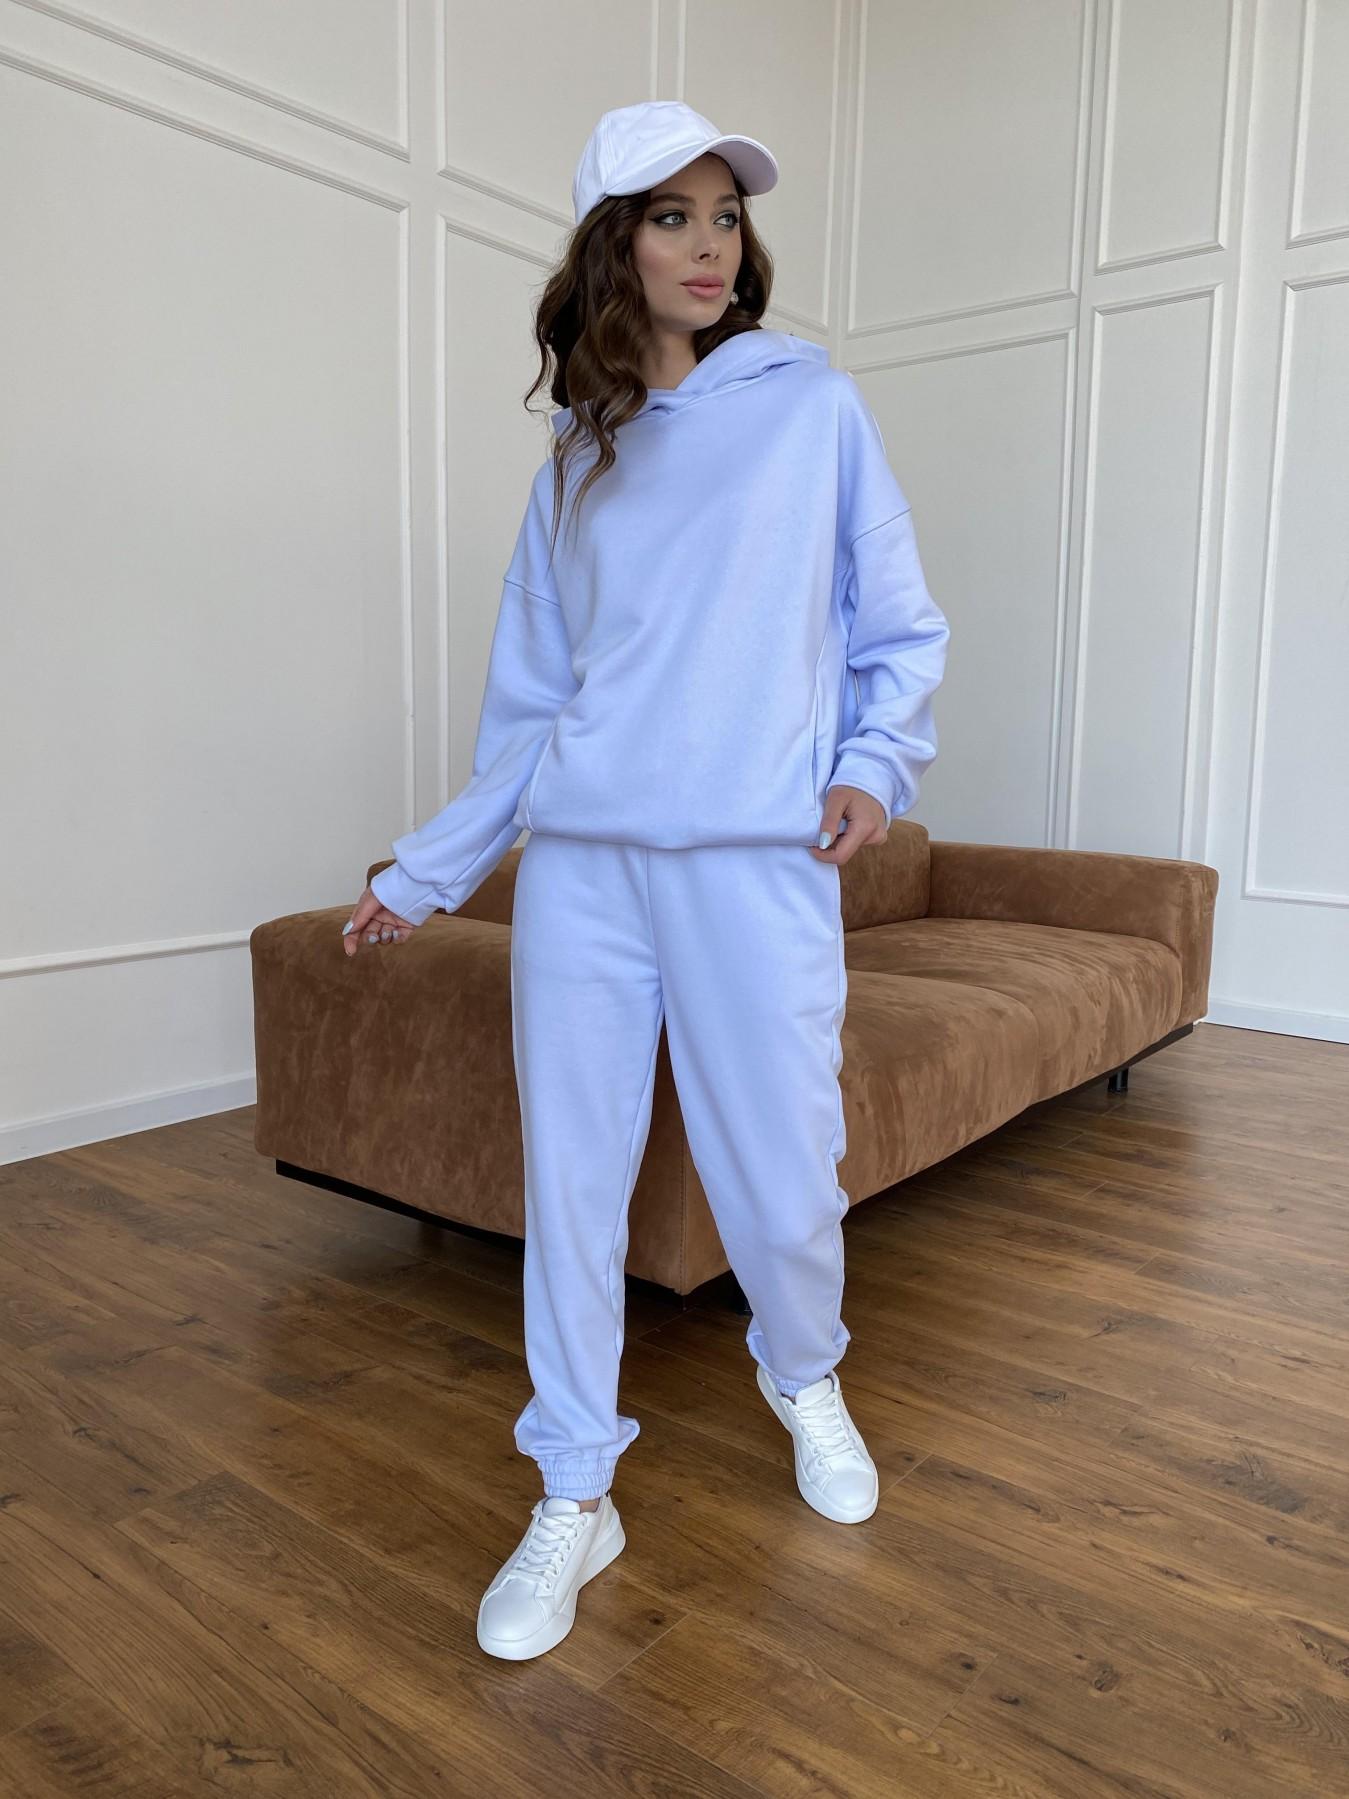 Мечтай костюм  трикотаж 3х нитка 11242 АРТ. 47757 Цвет: Голубой Светлый - фото 4, интернет магазин tm-modus.ru